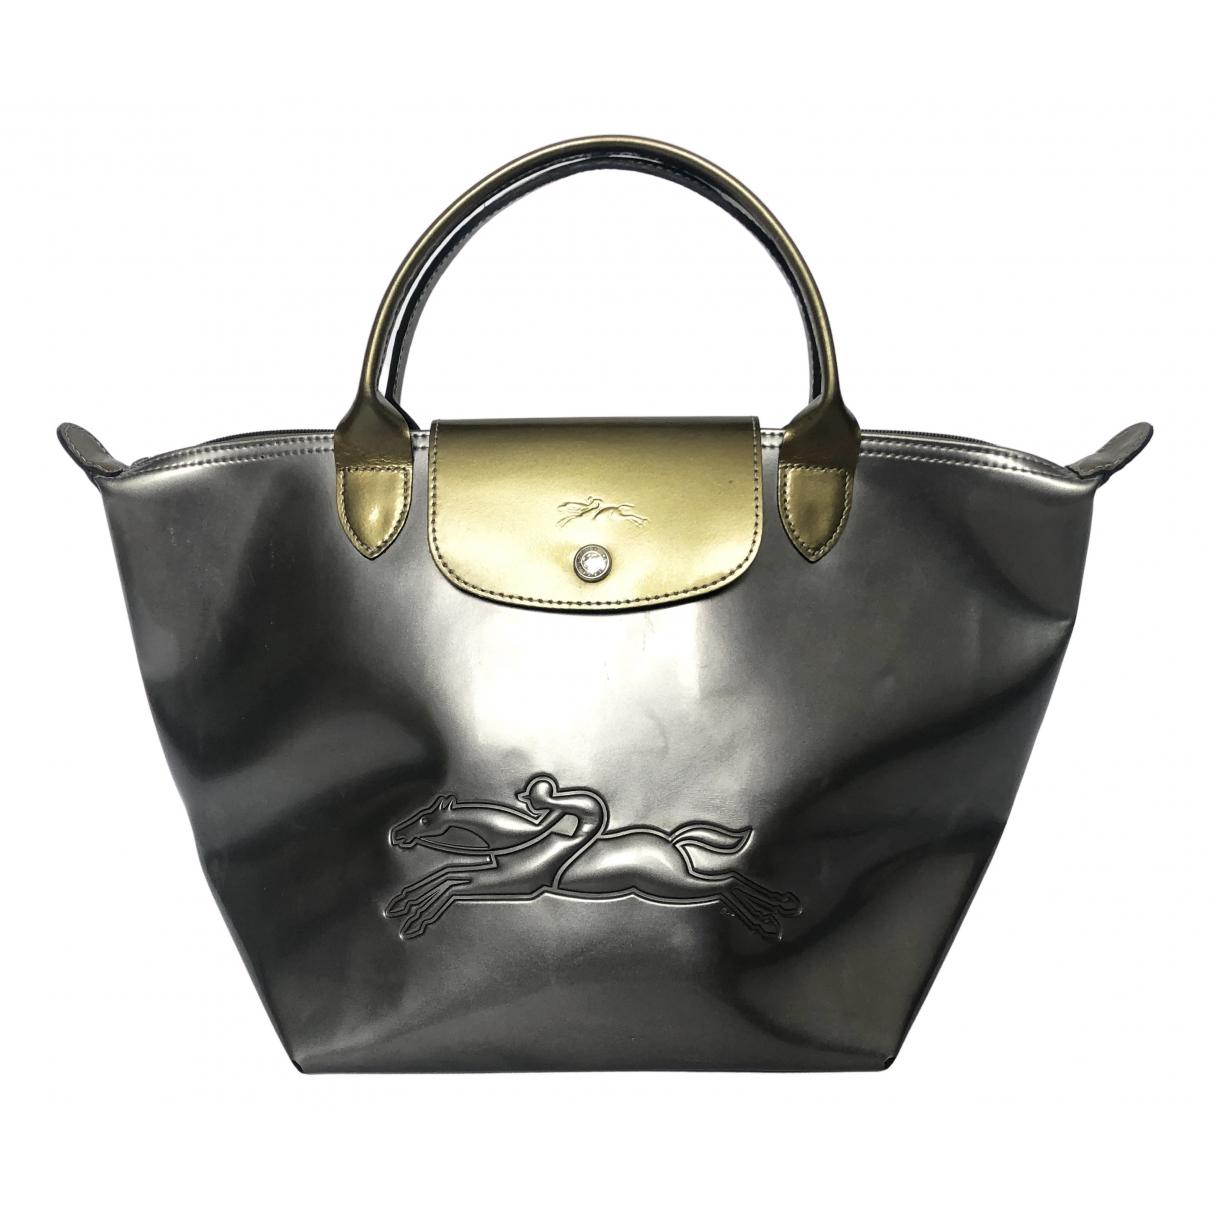 Longchamp N Metallic Patent leather handbag for Women N